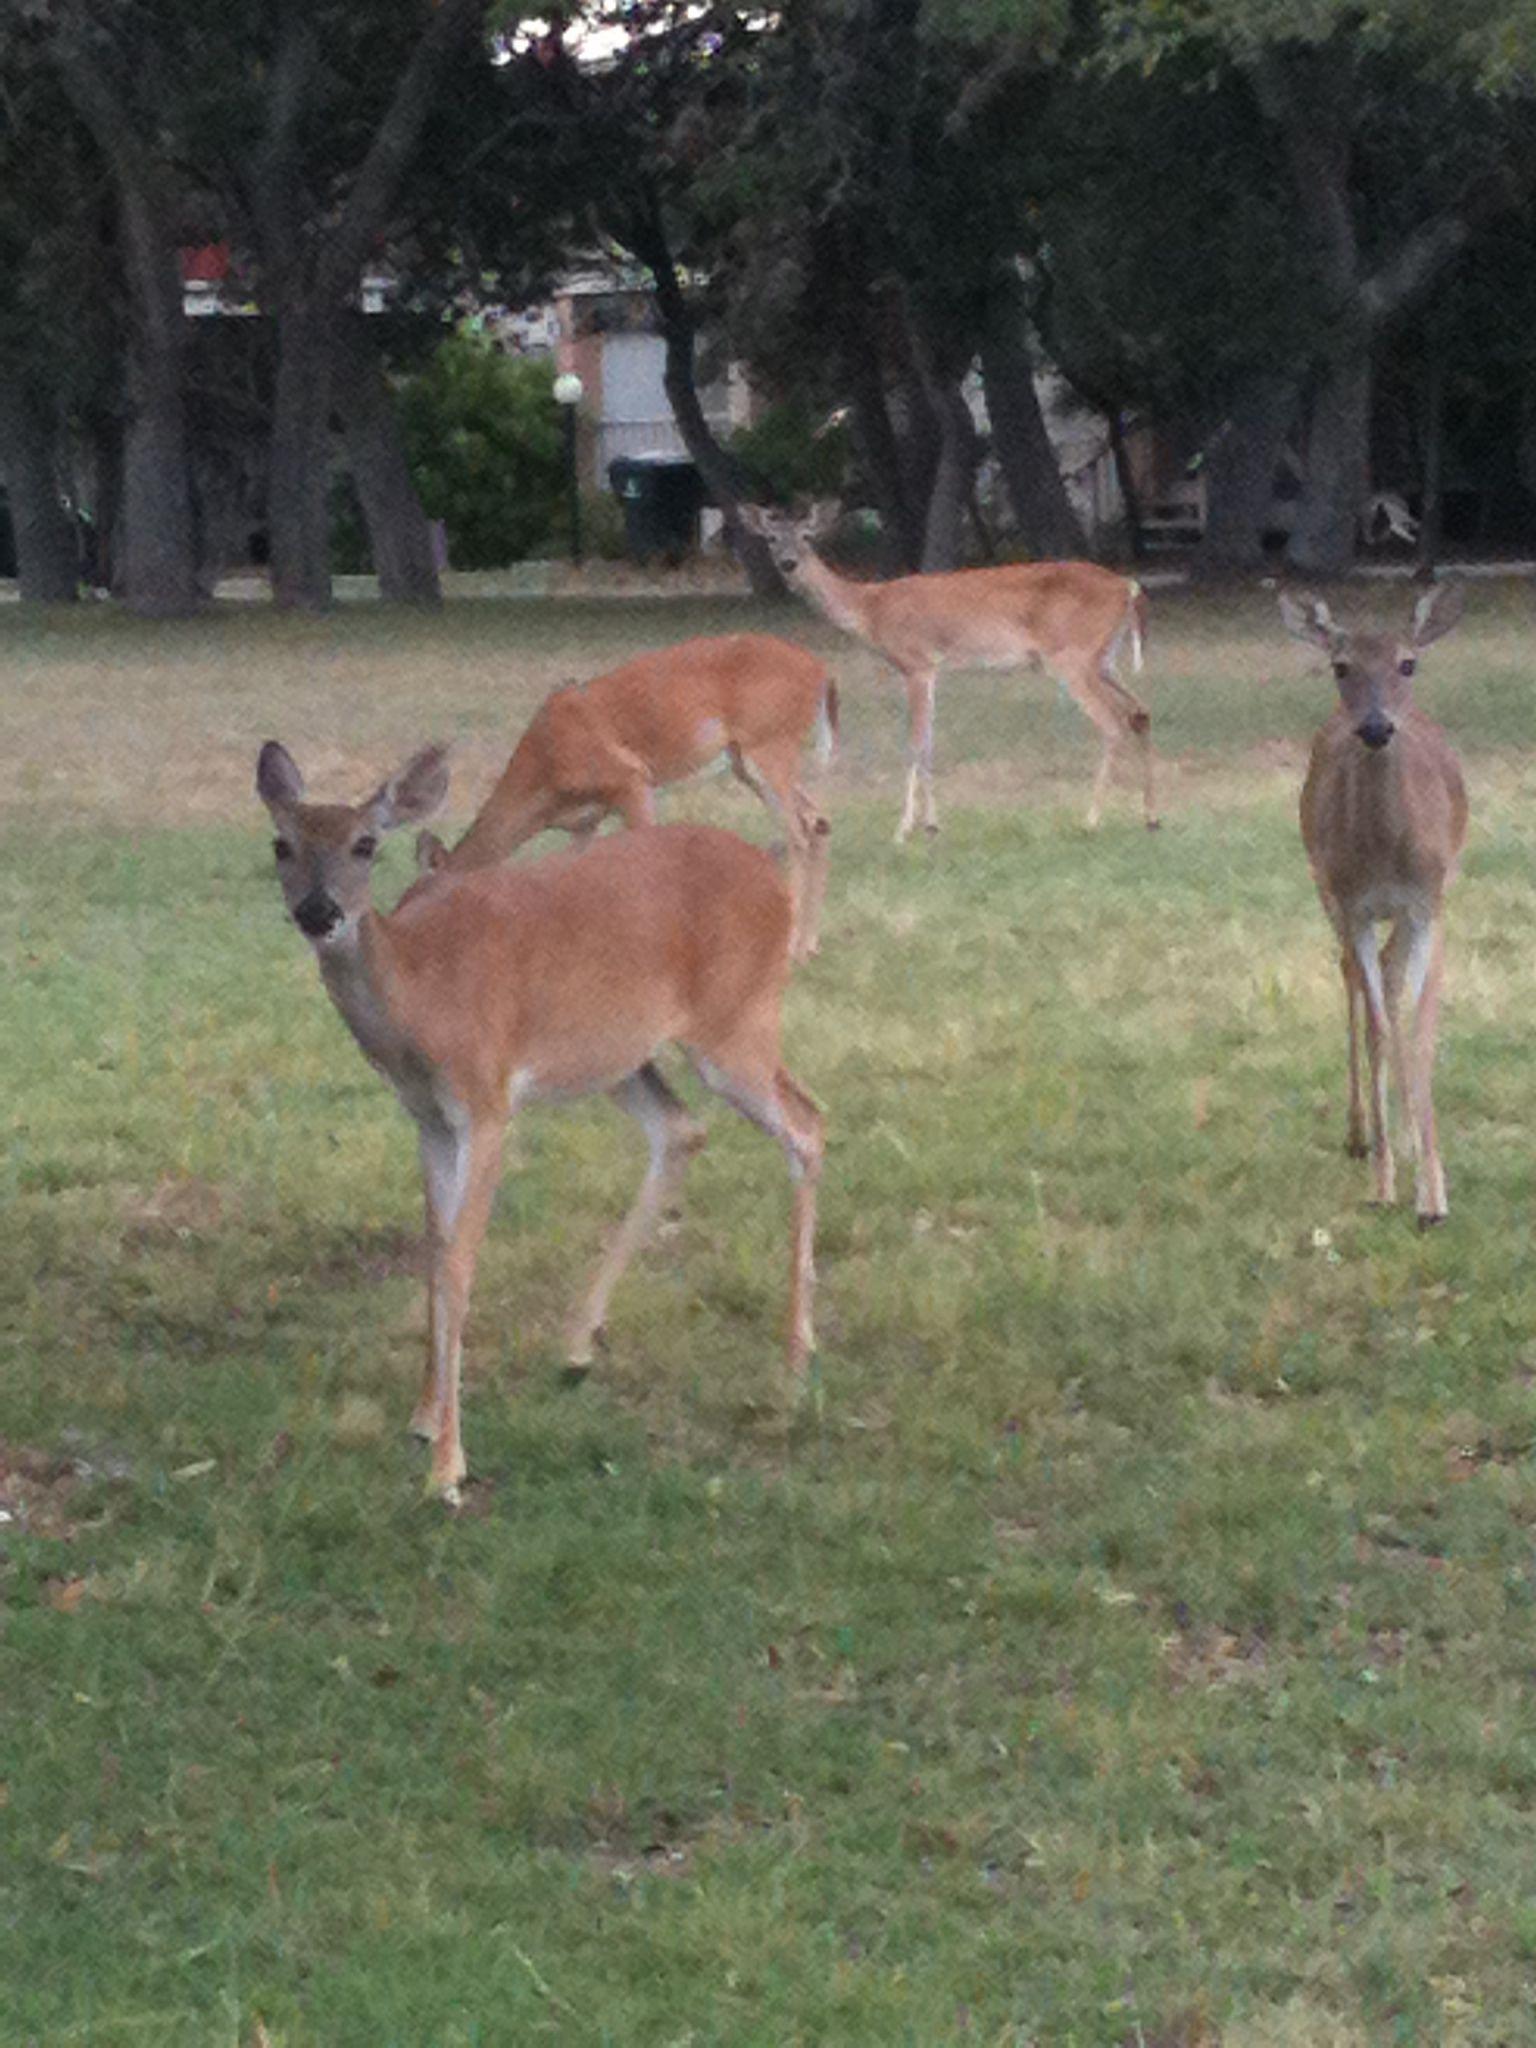 Pin by C Cordova on Favorites Deer, Animals